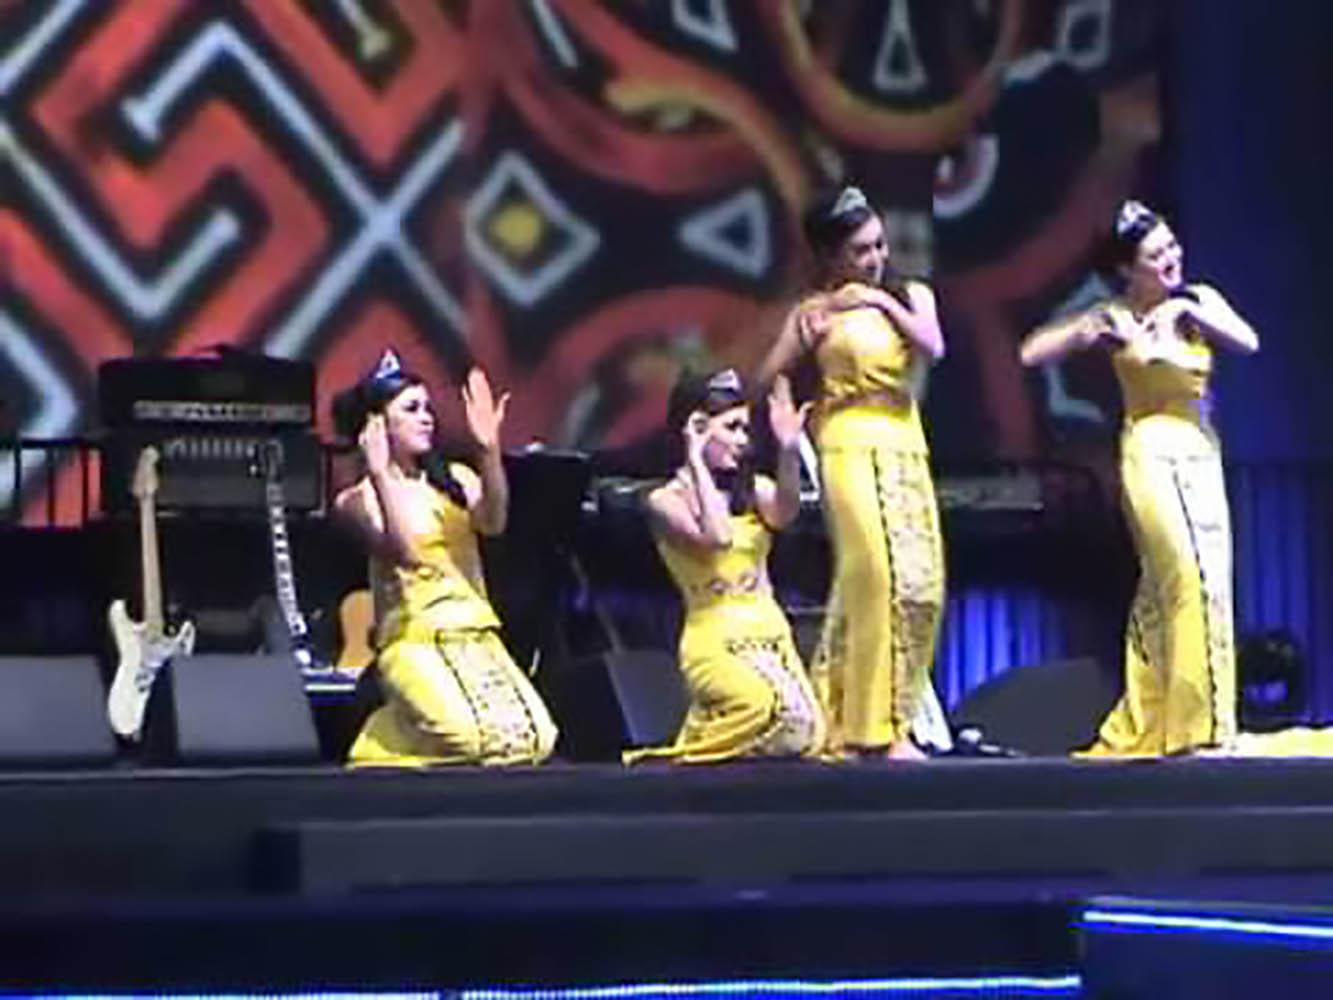 Tari Tumatenden, Tarian Tradisional Dari Provinsi Sulawesi Utara